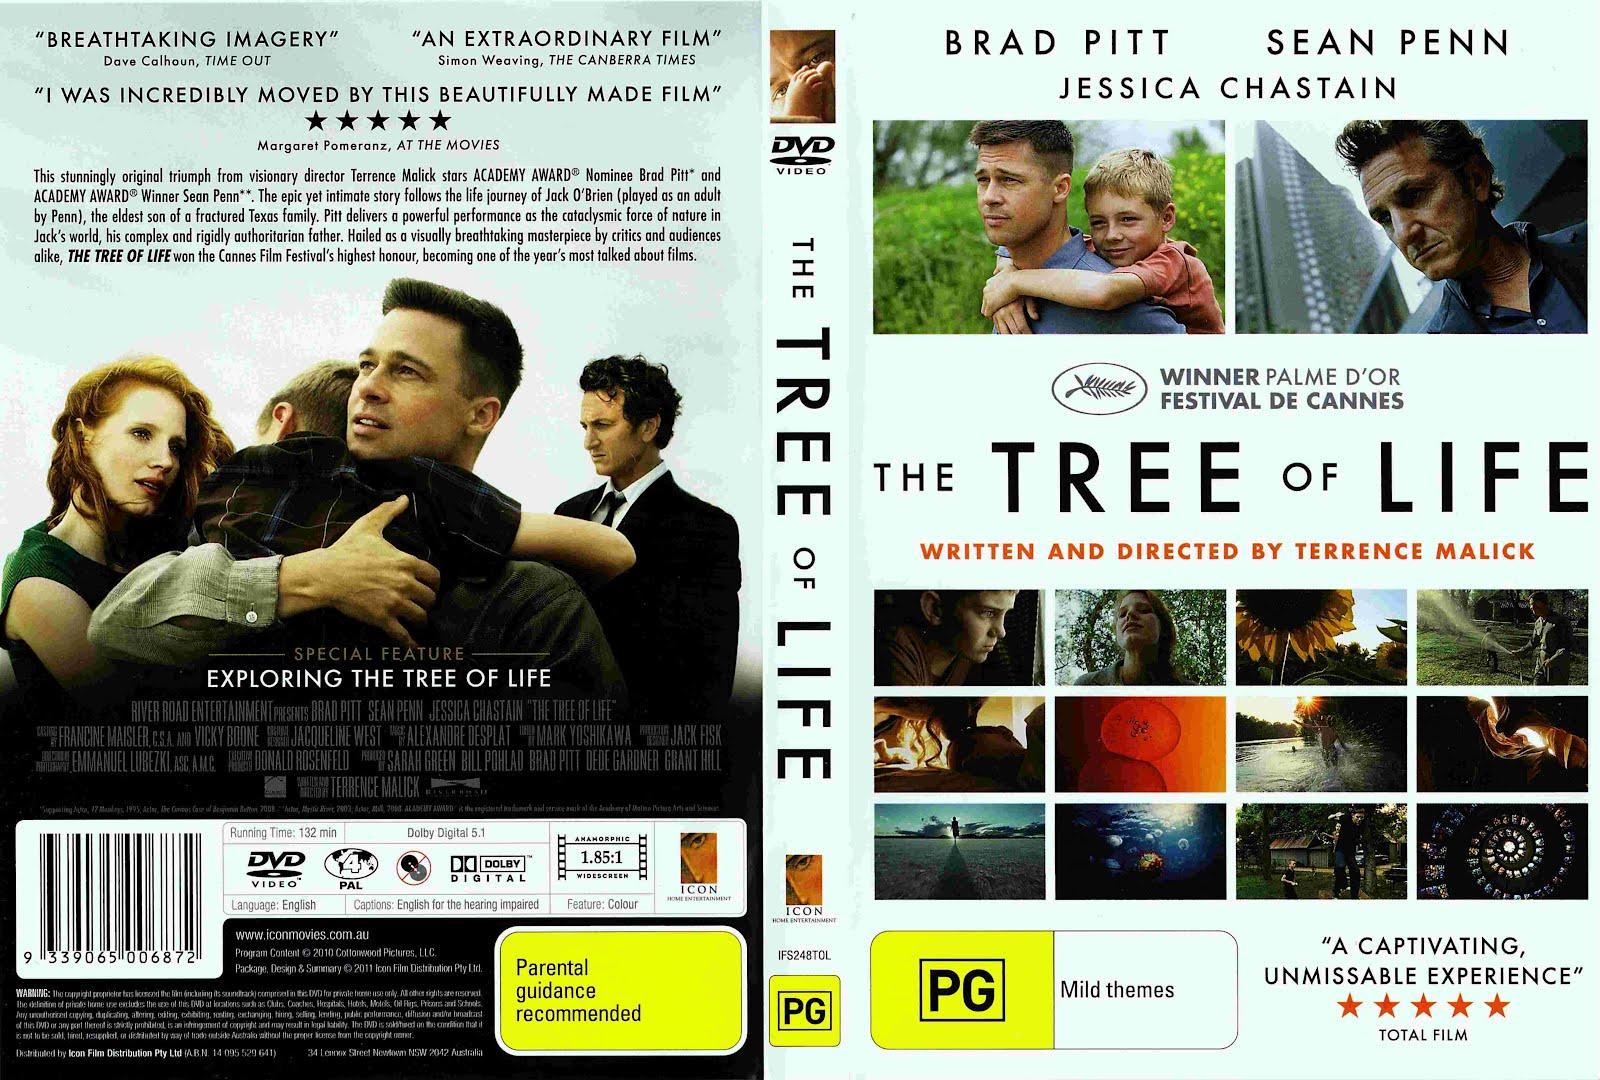 http://4.bp.blogspot.com/-AU8PvWX-lac/Tz3G6IlgcsI/AAAAAAAAEfo/5k9quBtHDQ0/s1600/The_Tree_Of_Life_%25282011%2529_WS_R4-%255Bfront%255D-%255Bwww.FreeCovers.net%255D.jpg